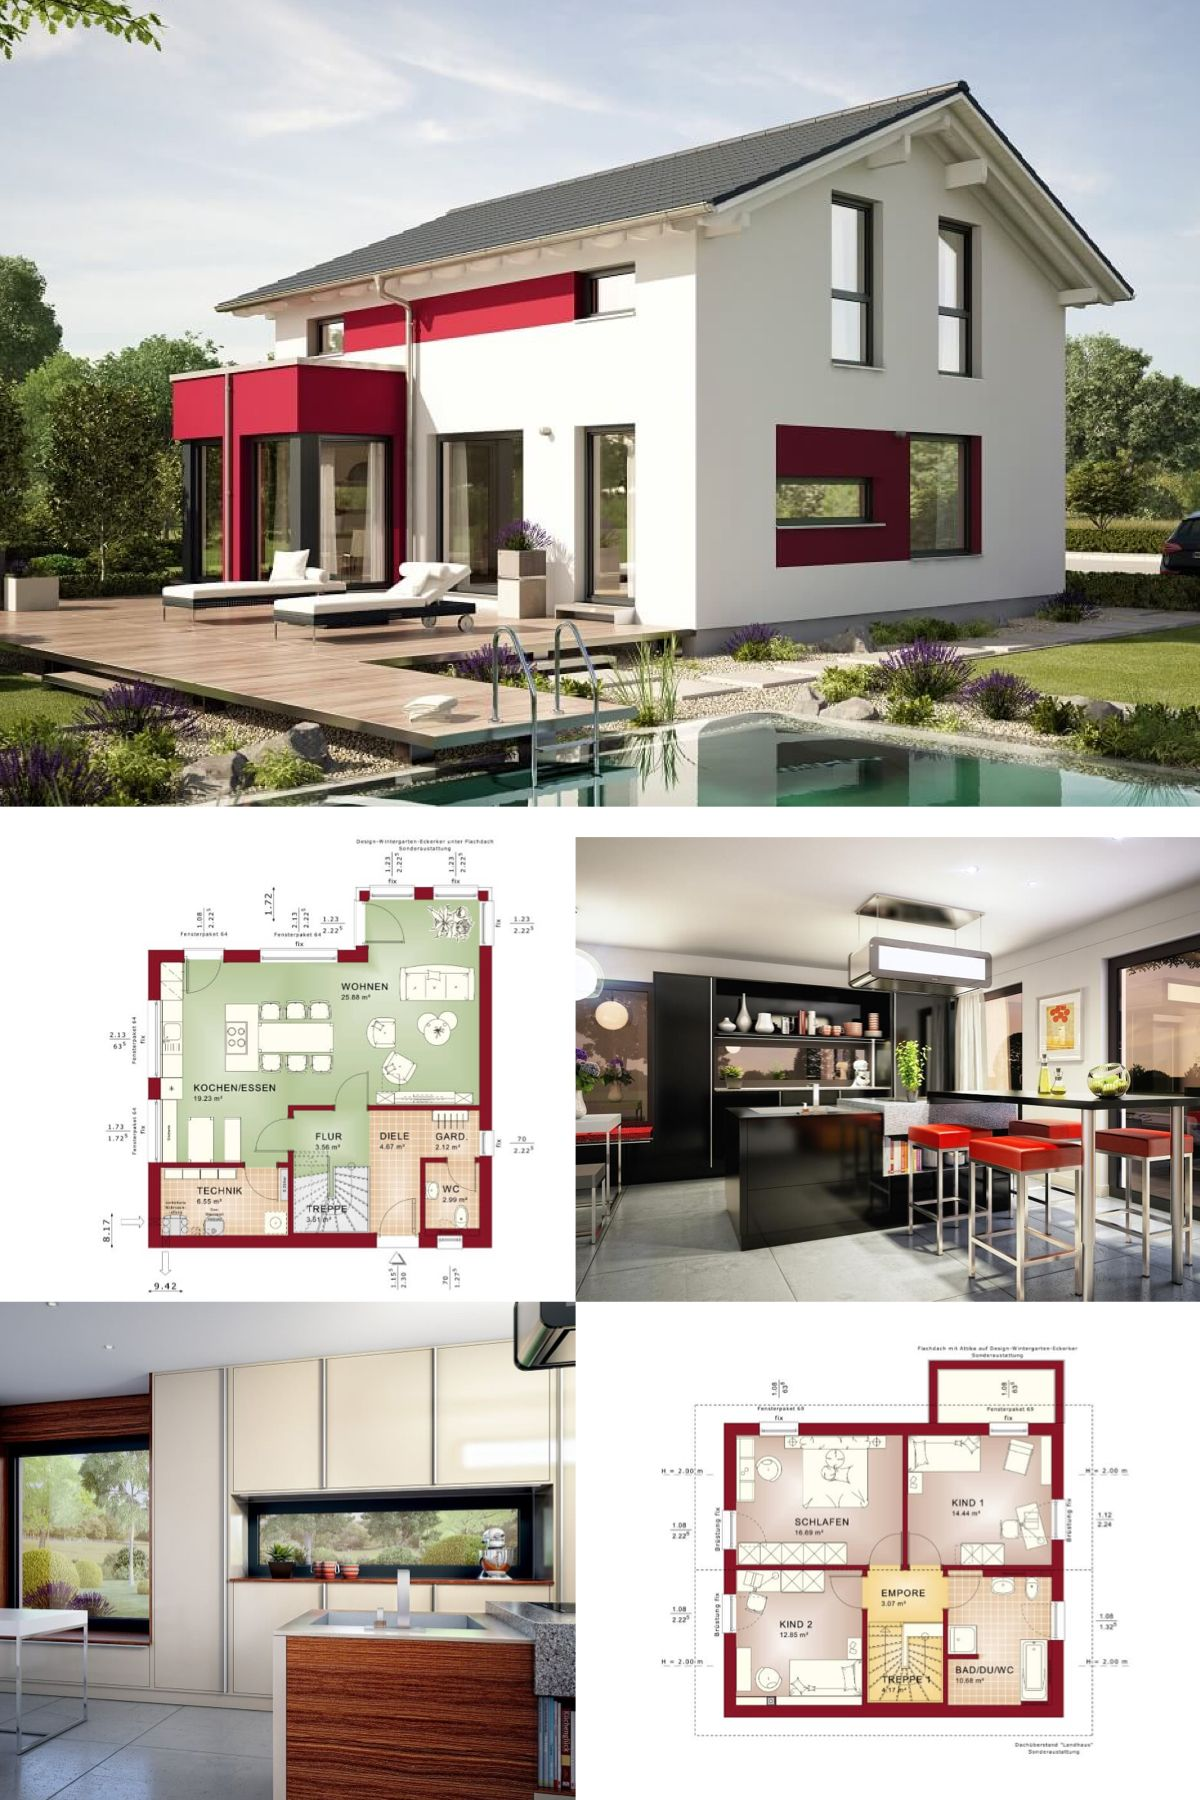 Einfamilienhaus Modern Grundriss   Haus Edition 1 V4 Bien Zenker    Fertighaus Satteldach Fassadengestaltung Putz